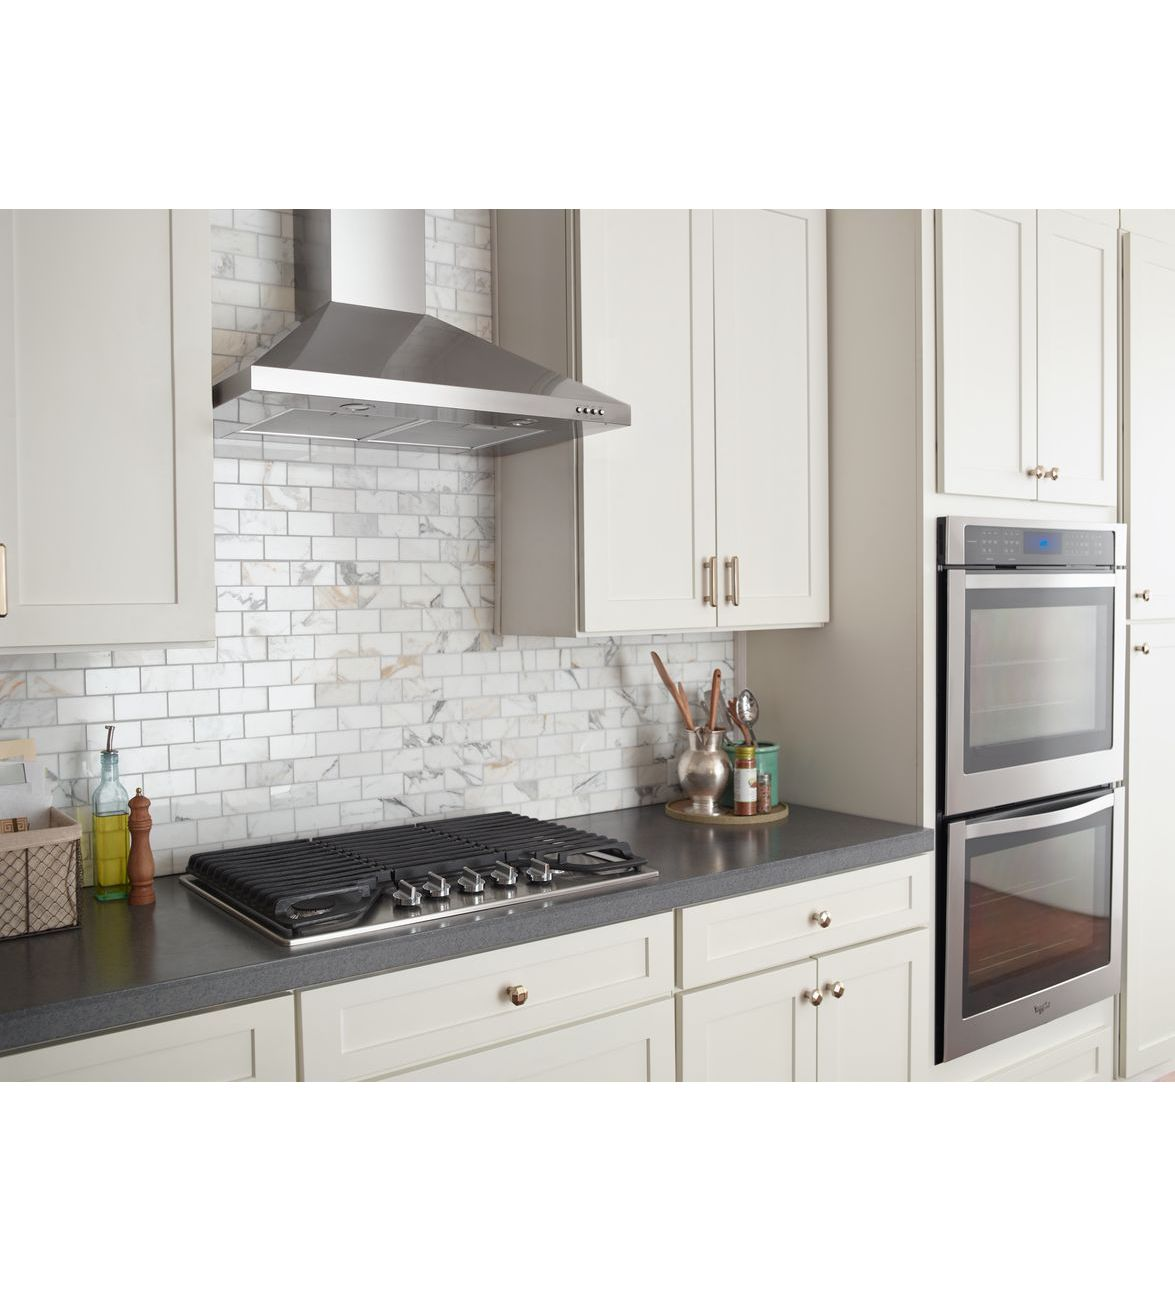 wvw53uc0fs hotte de cuisine murale contemporaine en acier inoxydable whirlpool de 30 po. Black Bedroom Furniture Sets. Home Design Ideas